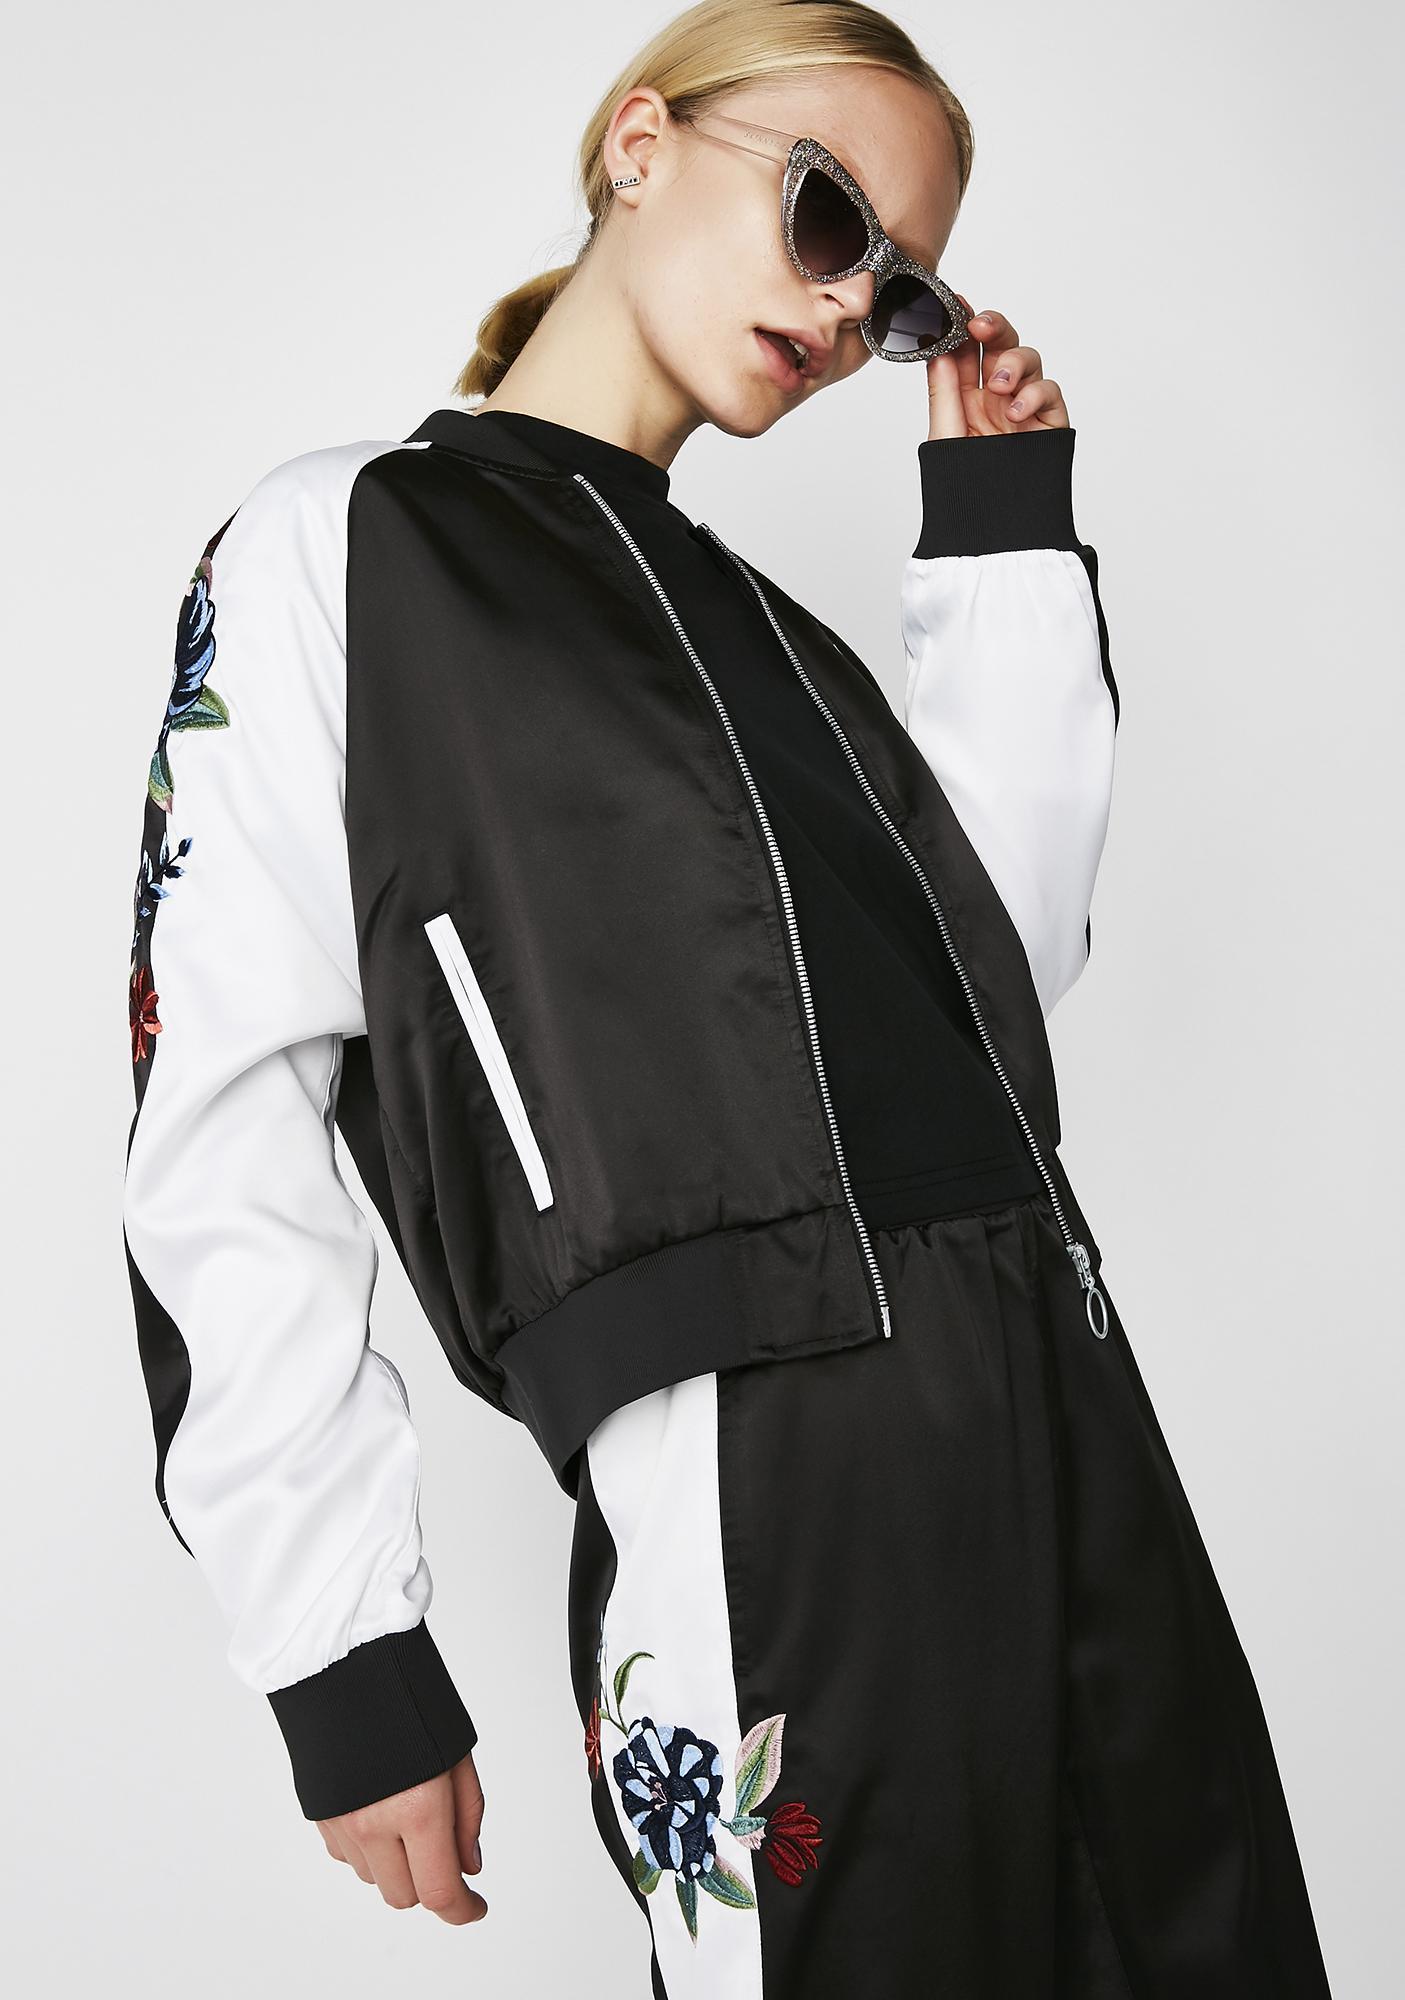 PUMA Premium Archive T7 Jacket